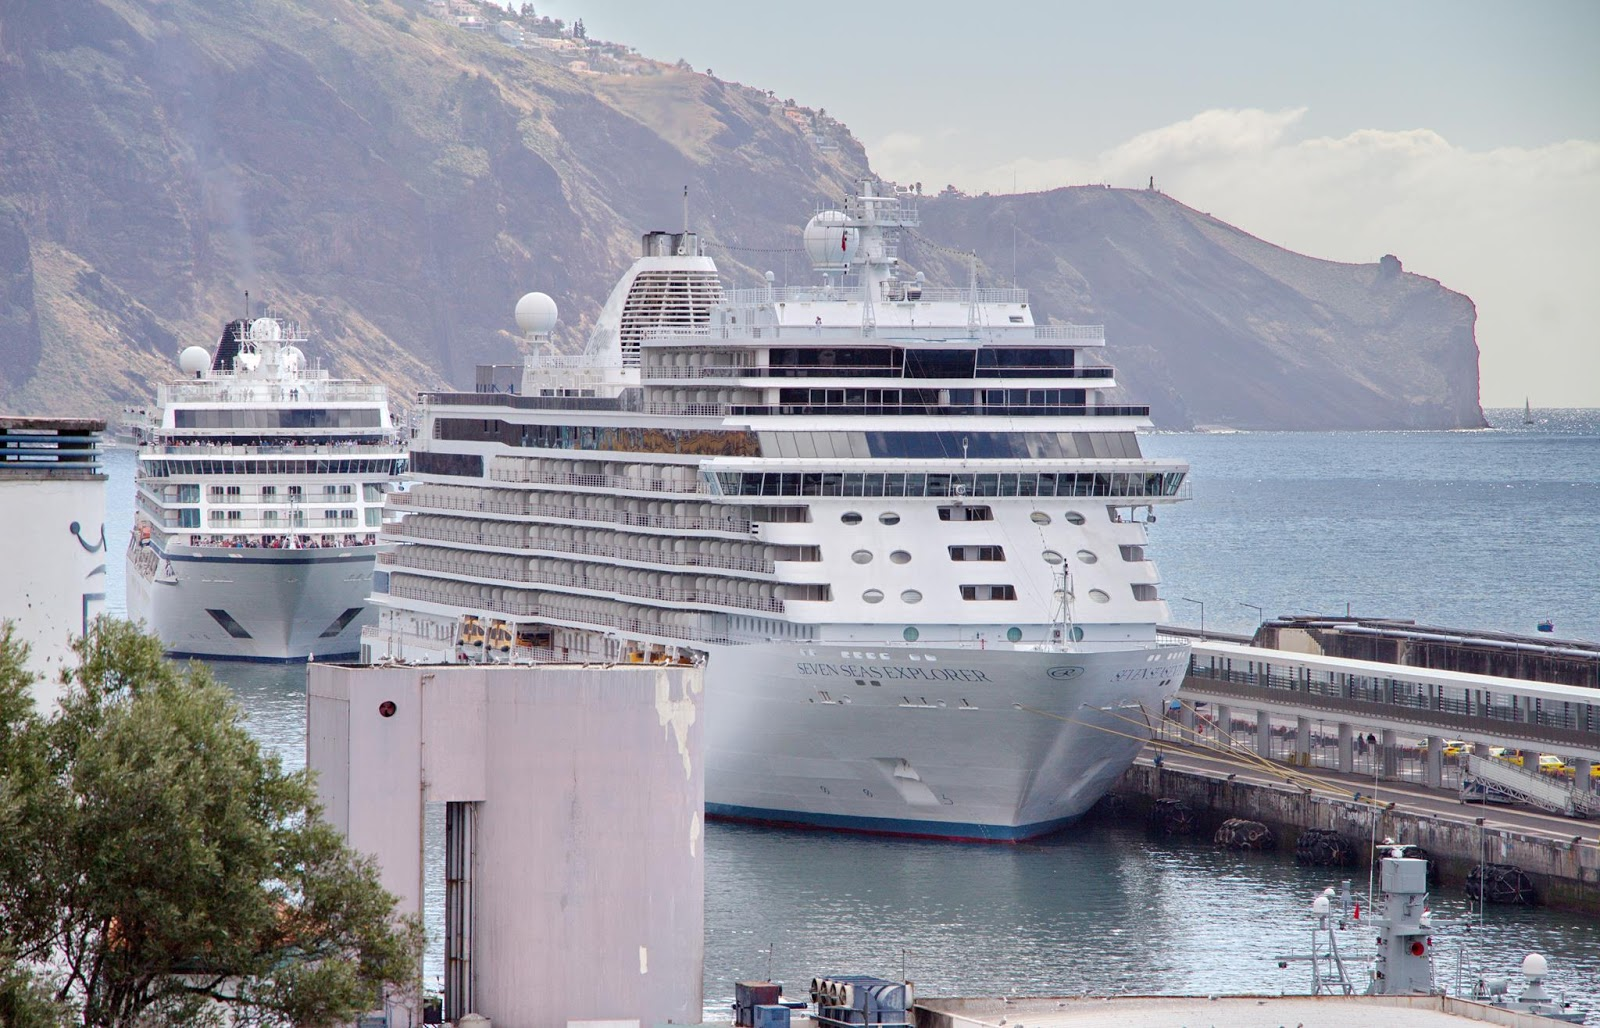 requinte no Porto do Funchal